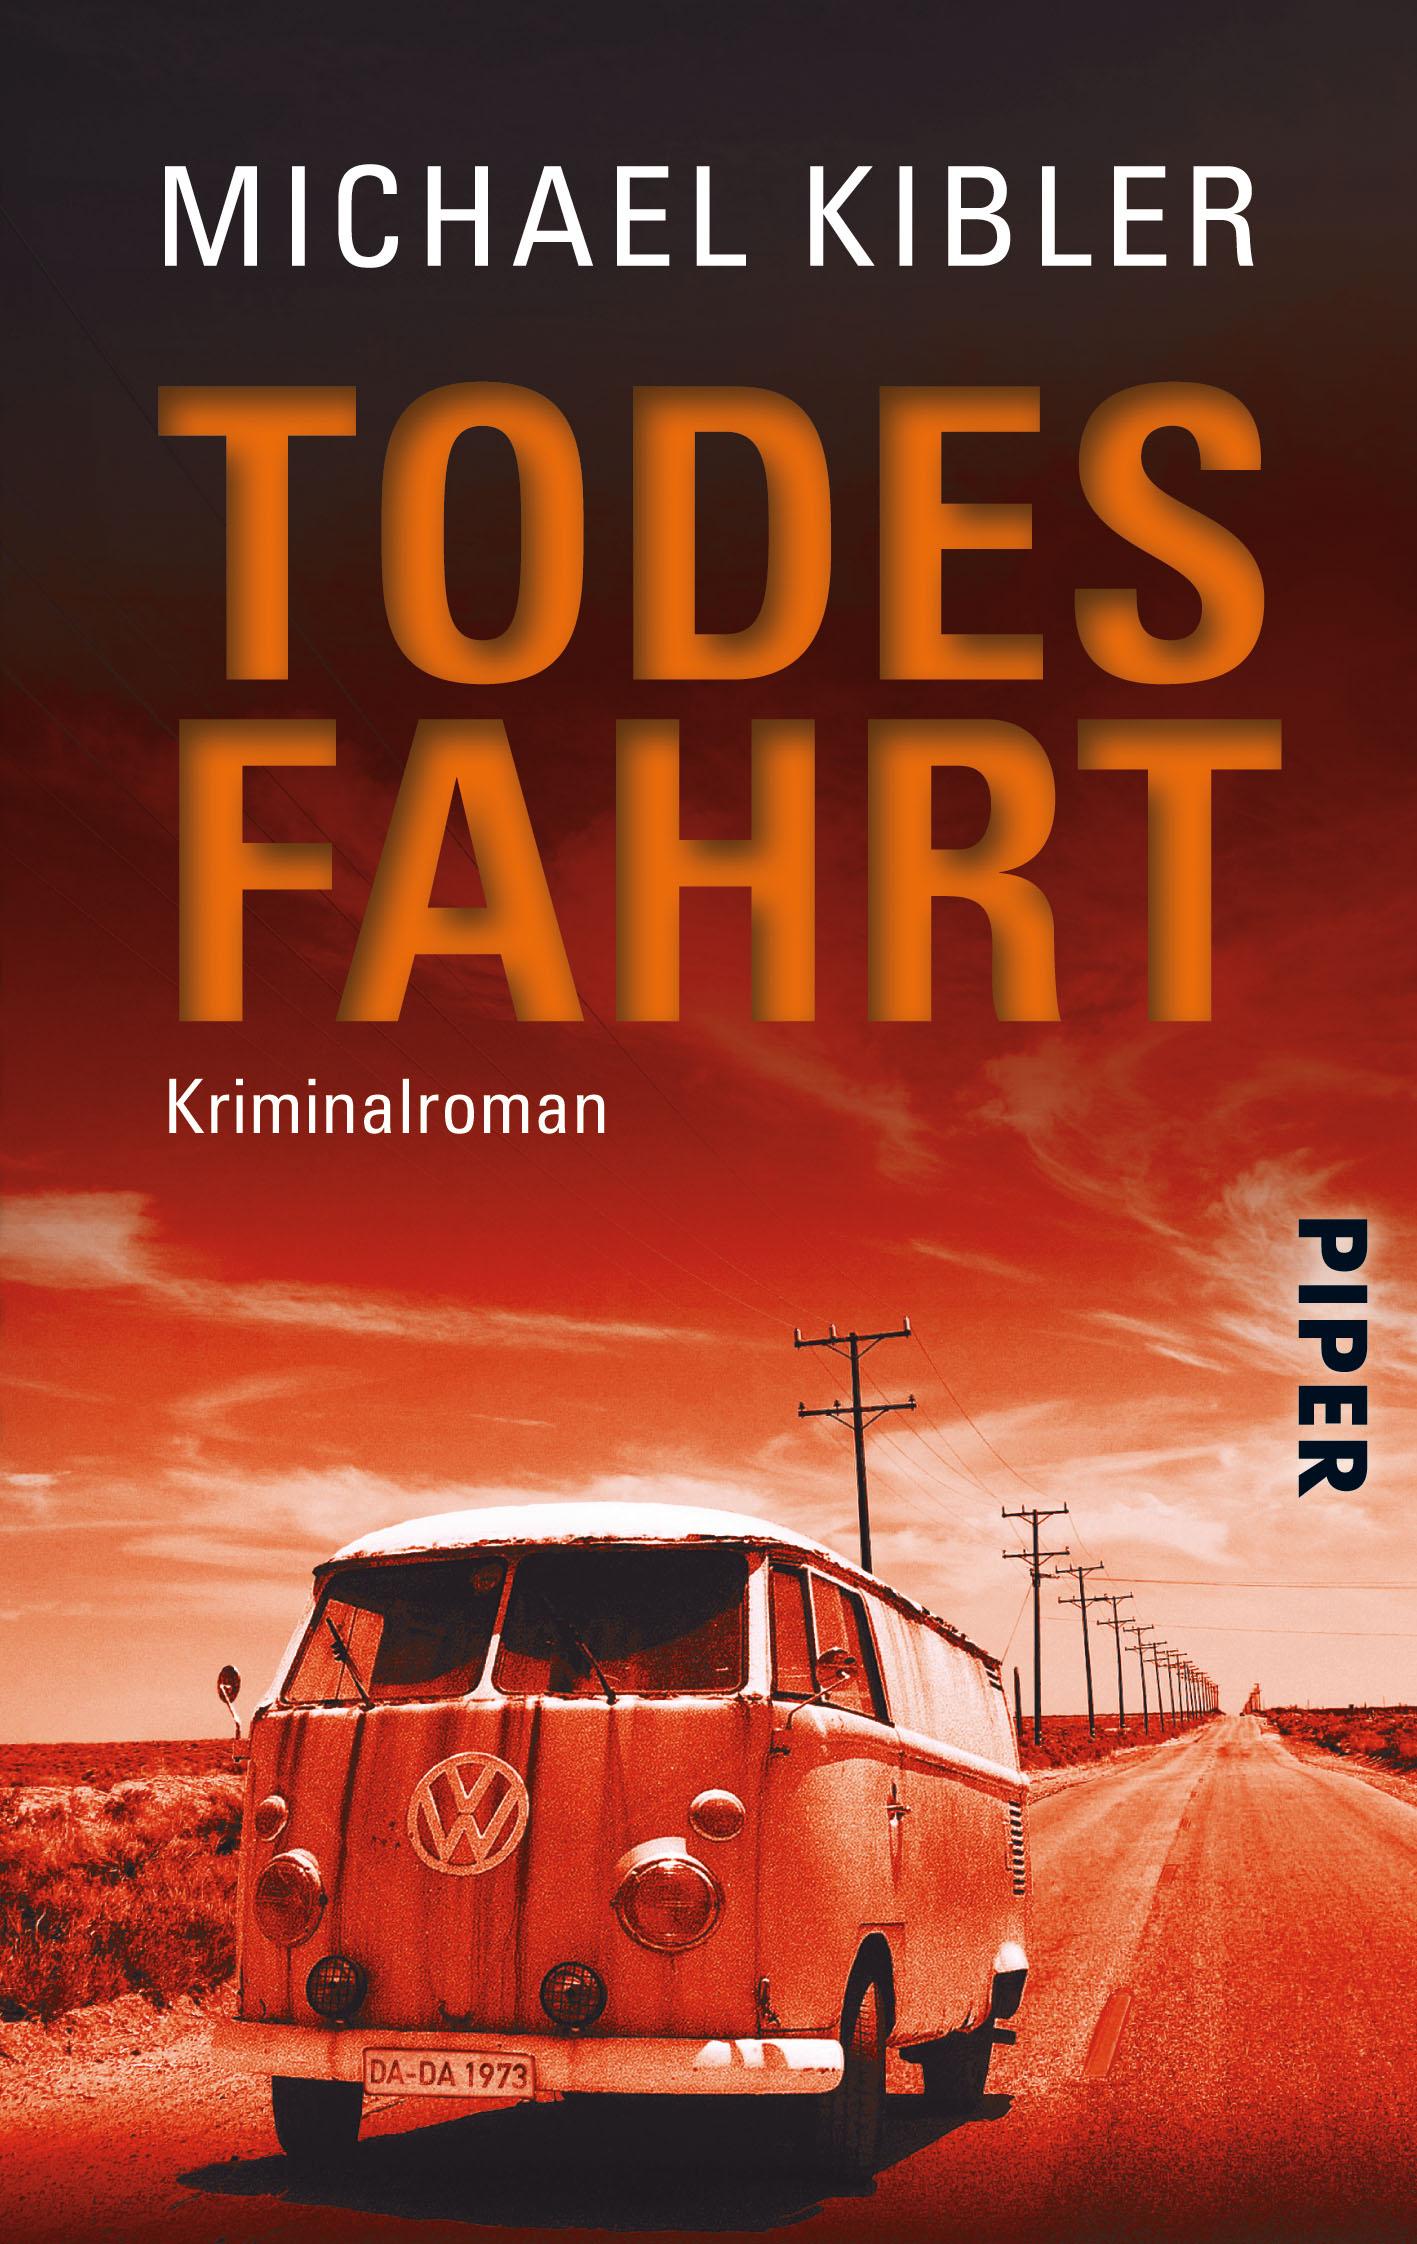 Todesfahrt: Kriminalroman - Michael Kibler